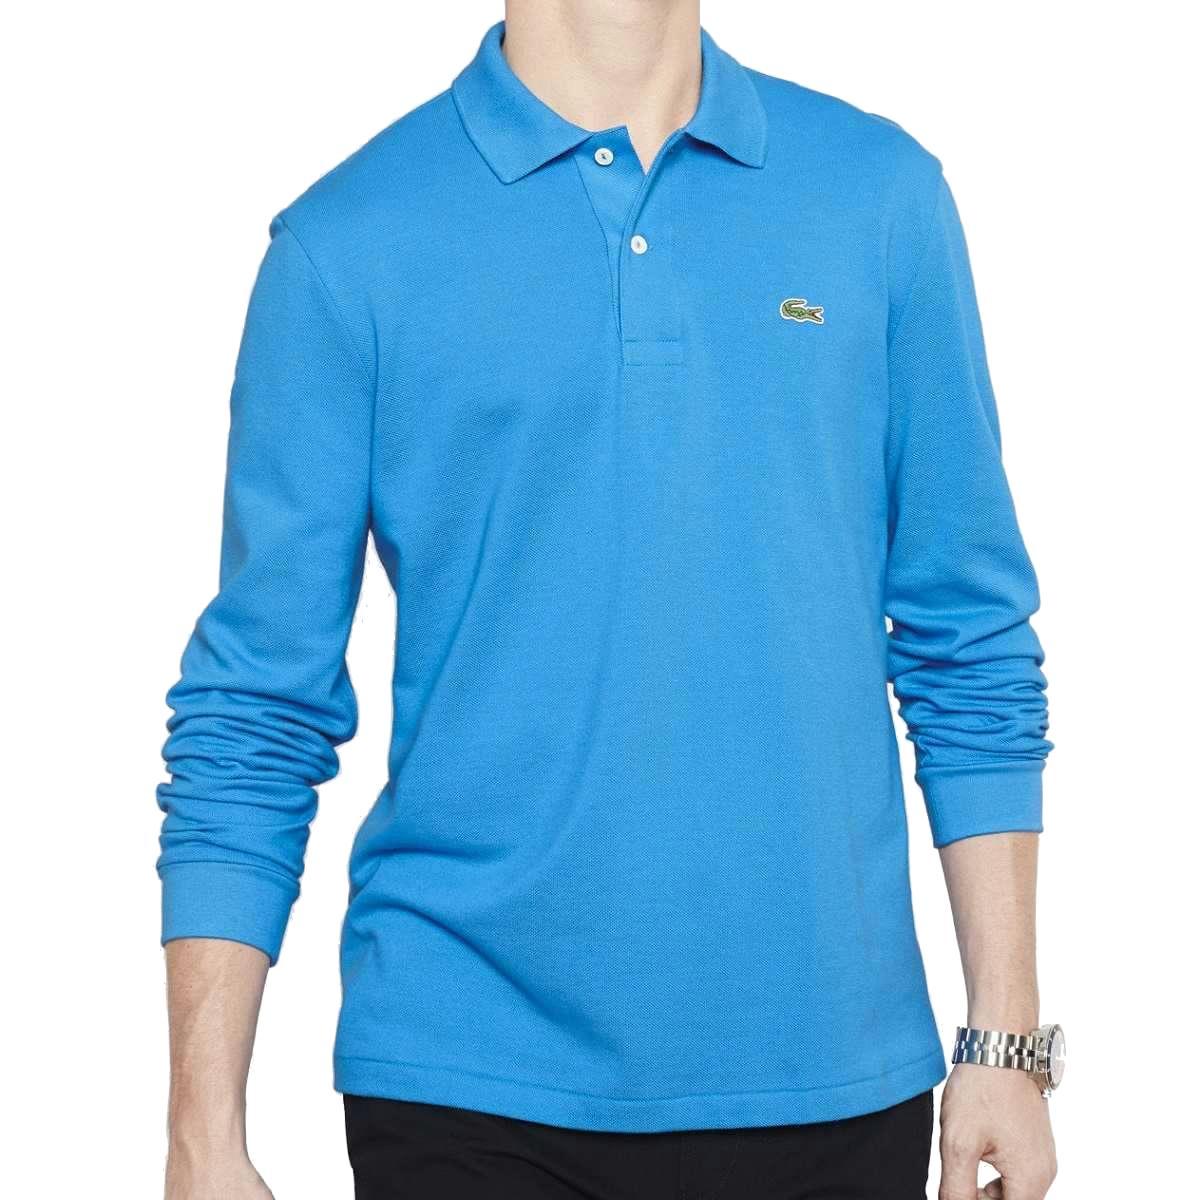 Original lacoste polo l1312 long sleeve men 39 s polo for Lacoste polo shirts ebay